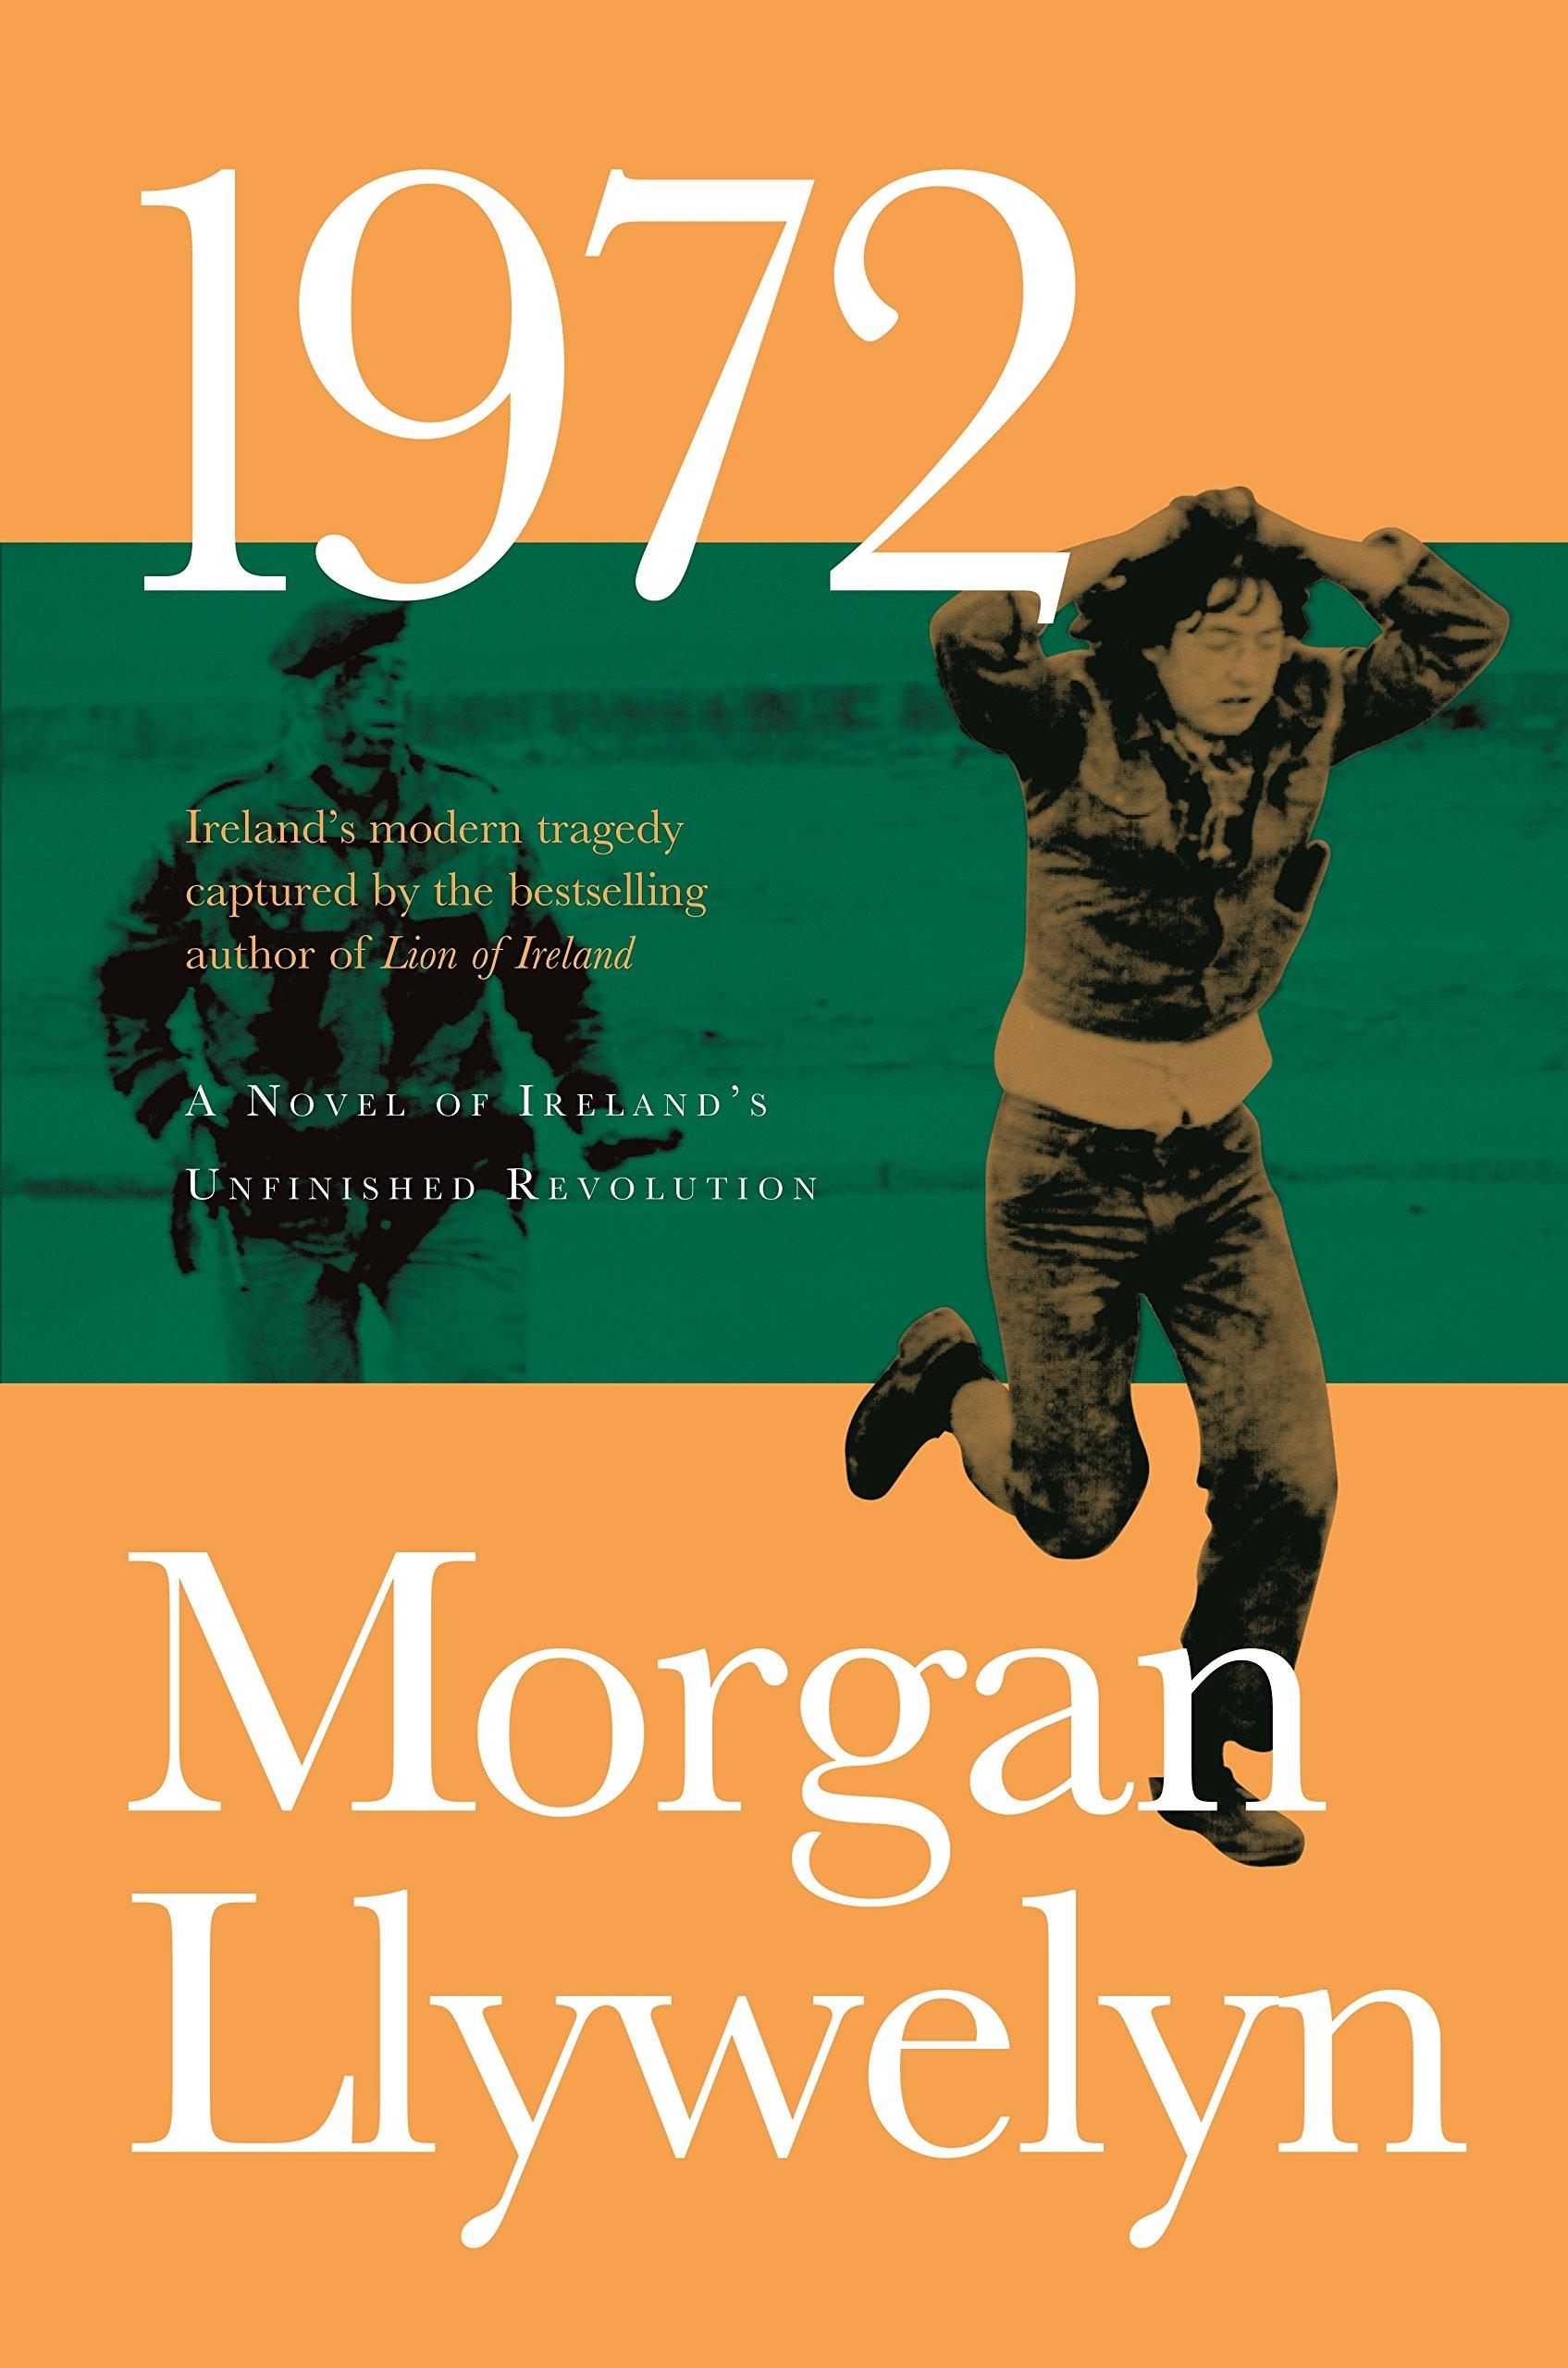 1972: A Novel of Ireland's Unfinished Revolution (Irish Century): Morgan  Llywelyn: 9780765381330: Amazon.com: Books